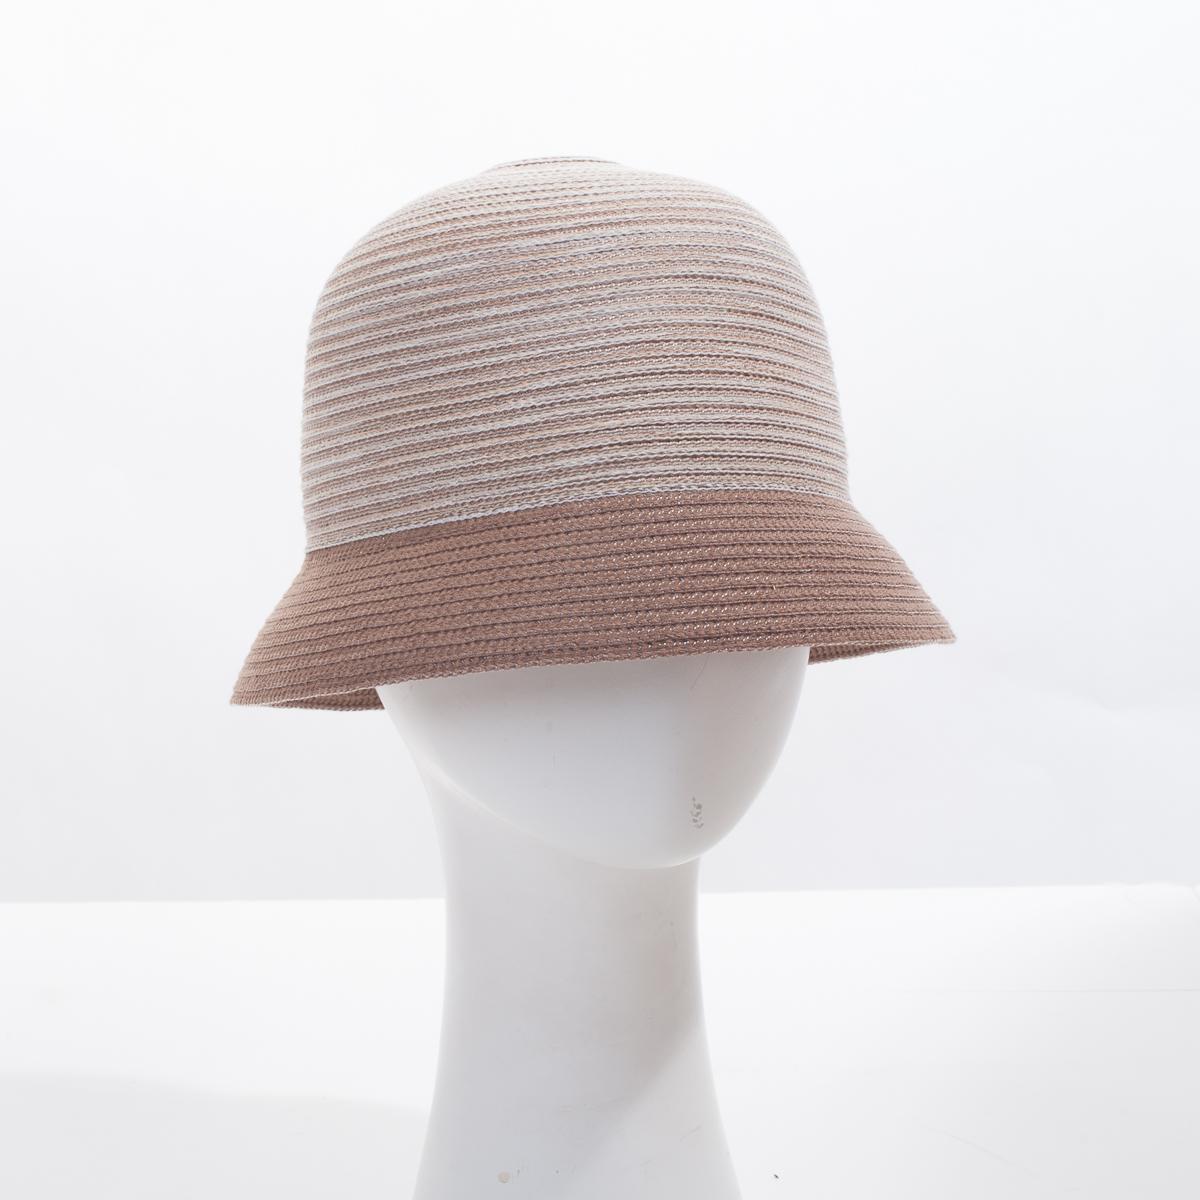 0f4ad129d32 Beige Plain Cloche Hats-720044-BG- Sun Yorkos